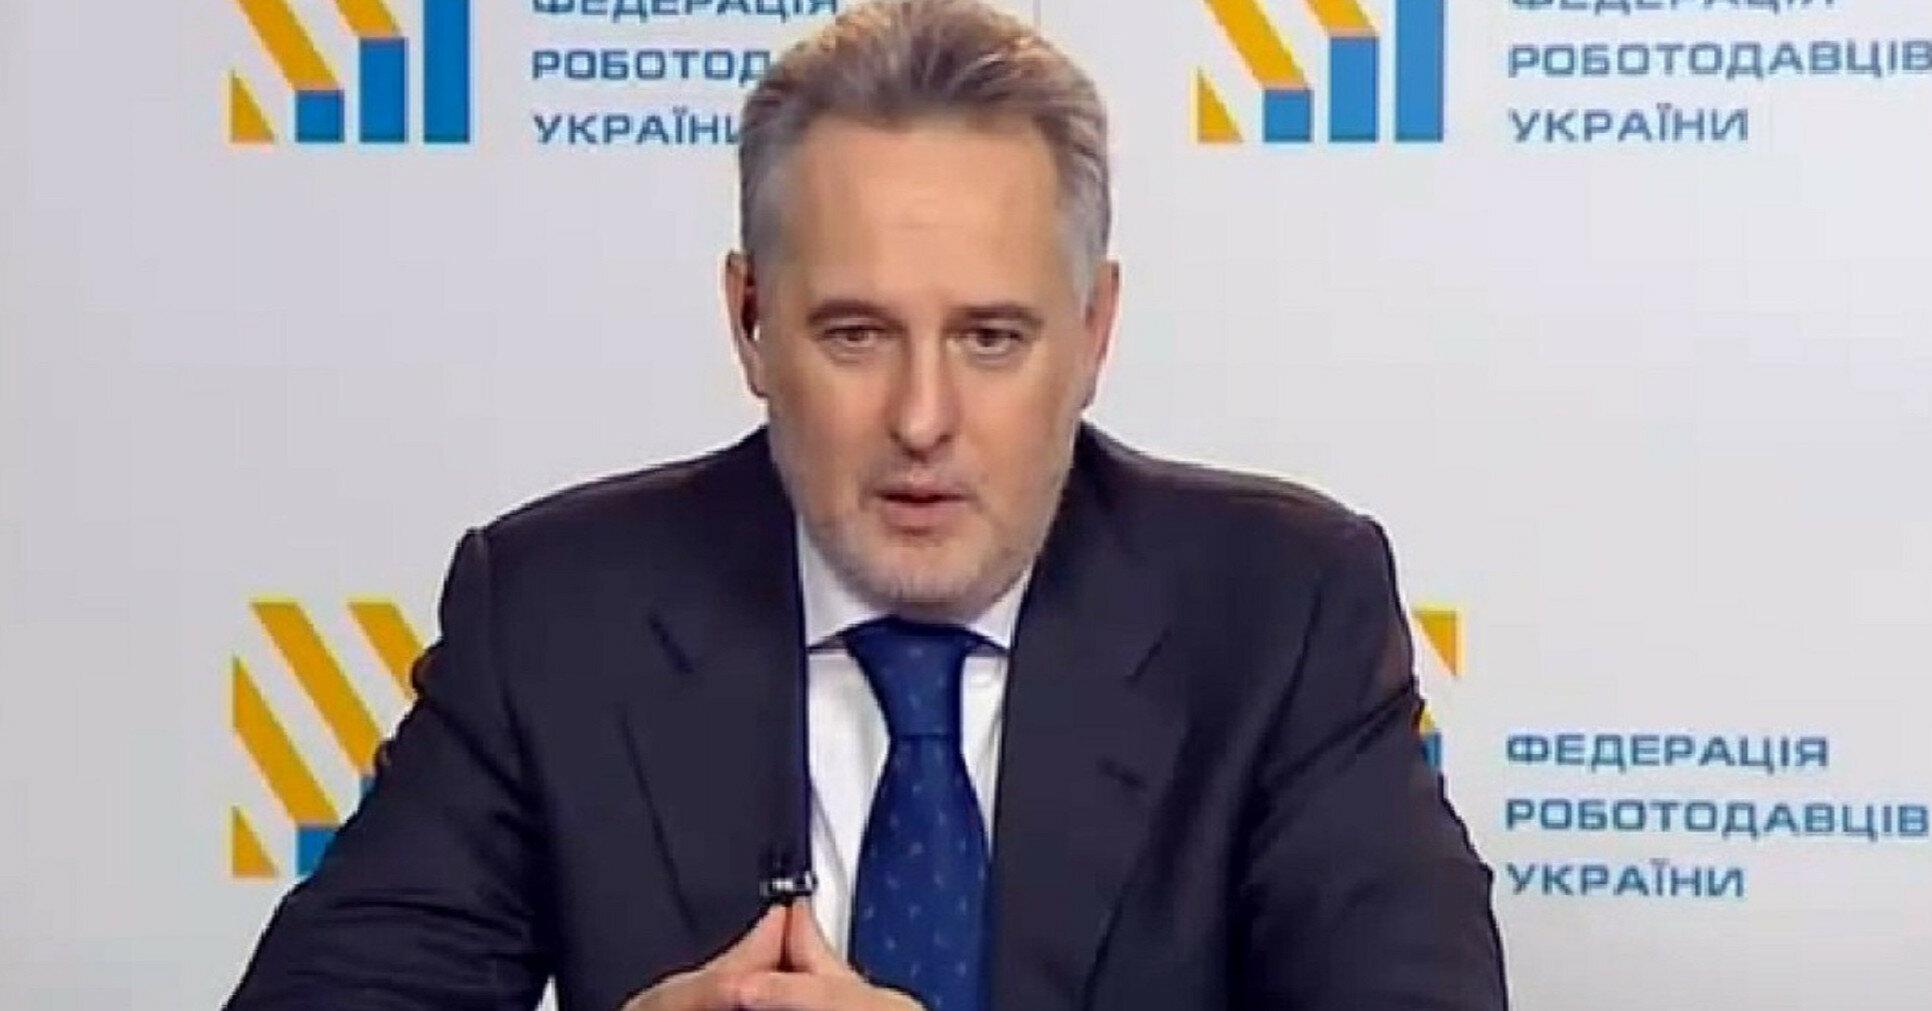 За три дня до введения санкций Фирташу списали 23 млрд долгов